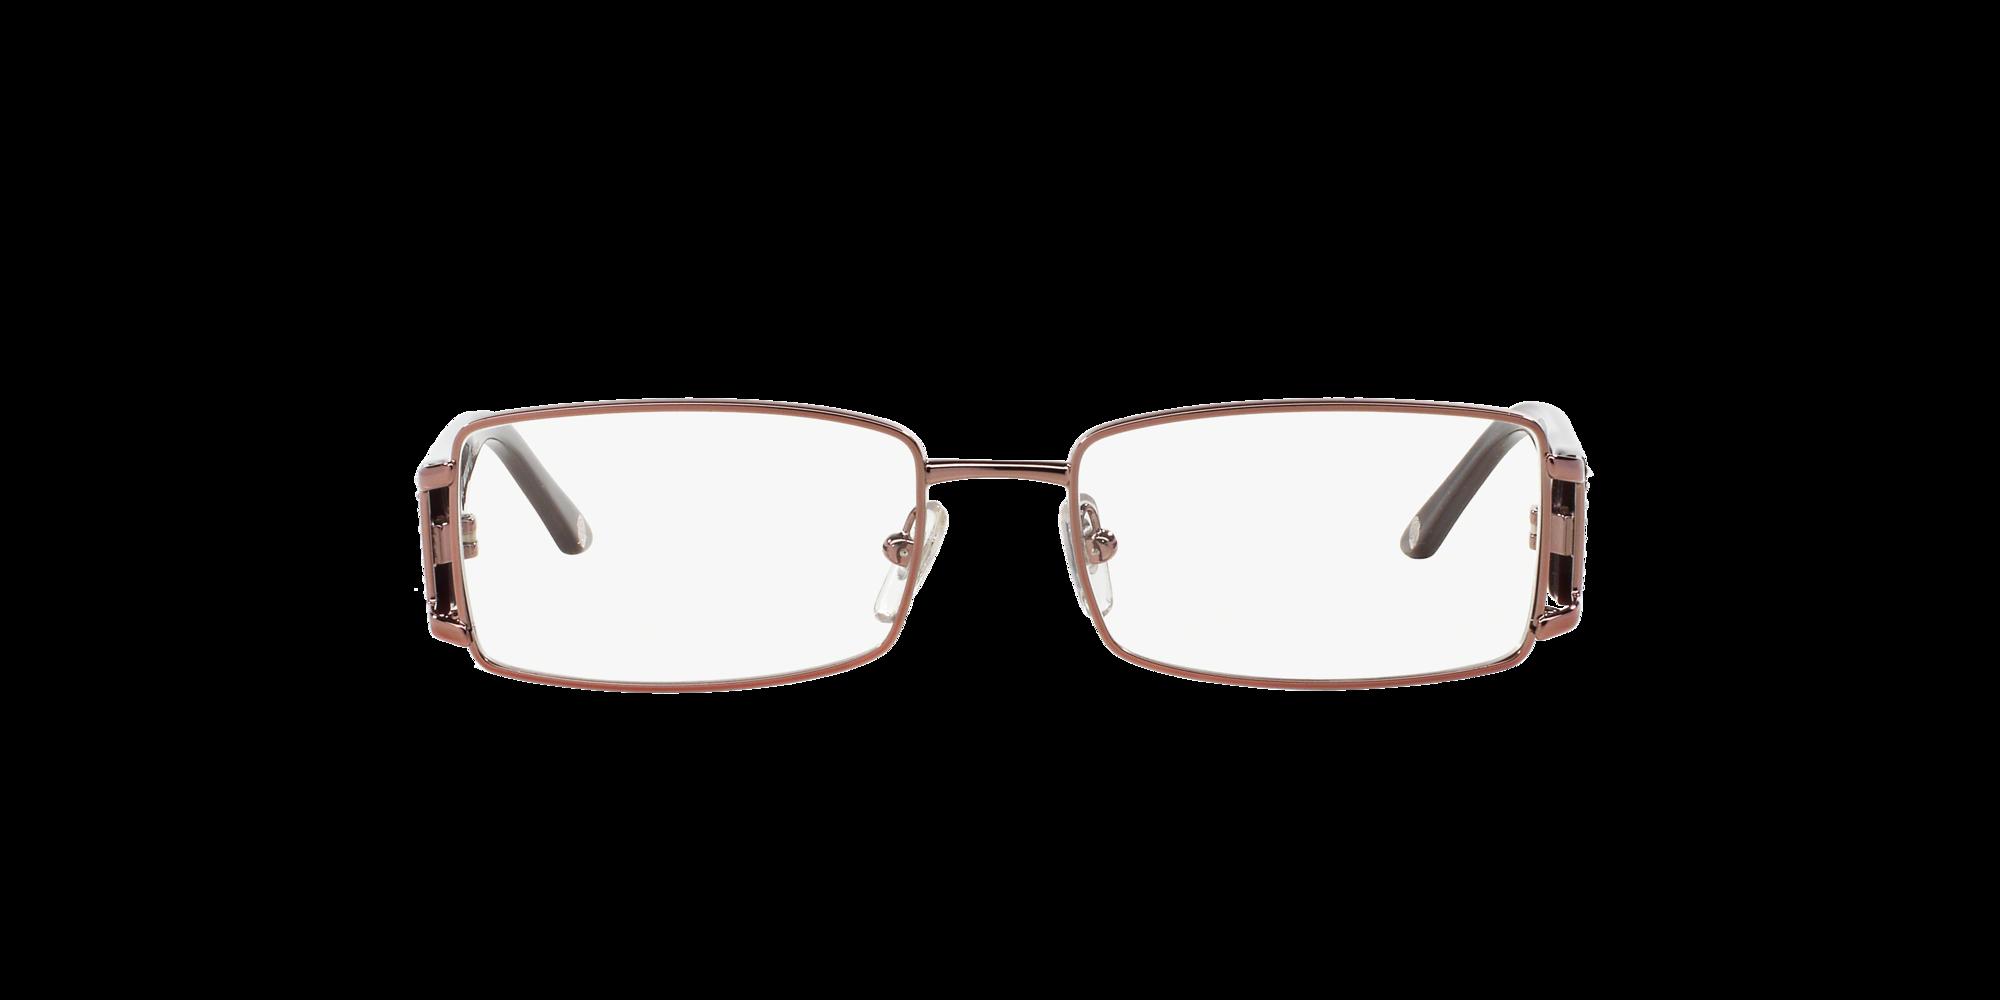 Image for VE 1163B from LensCrafters | Glasses, Prescription Glasses Online, Eyewear